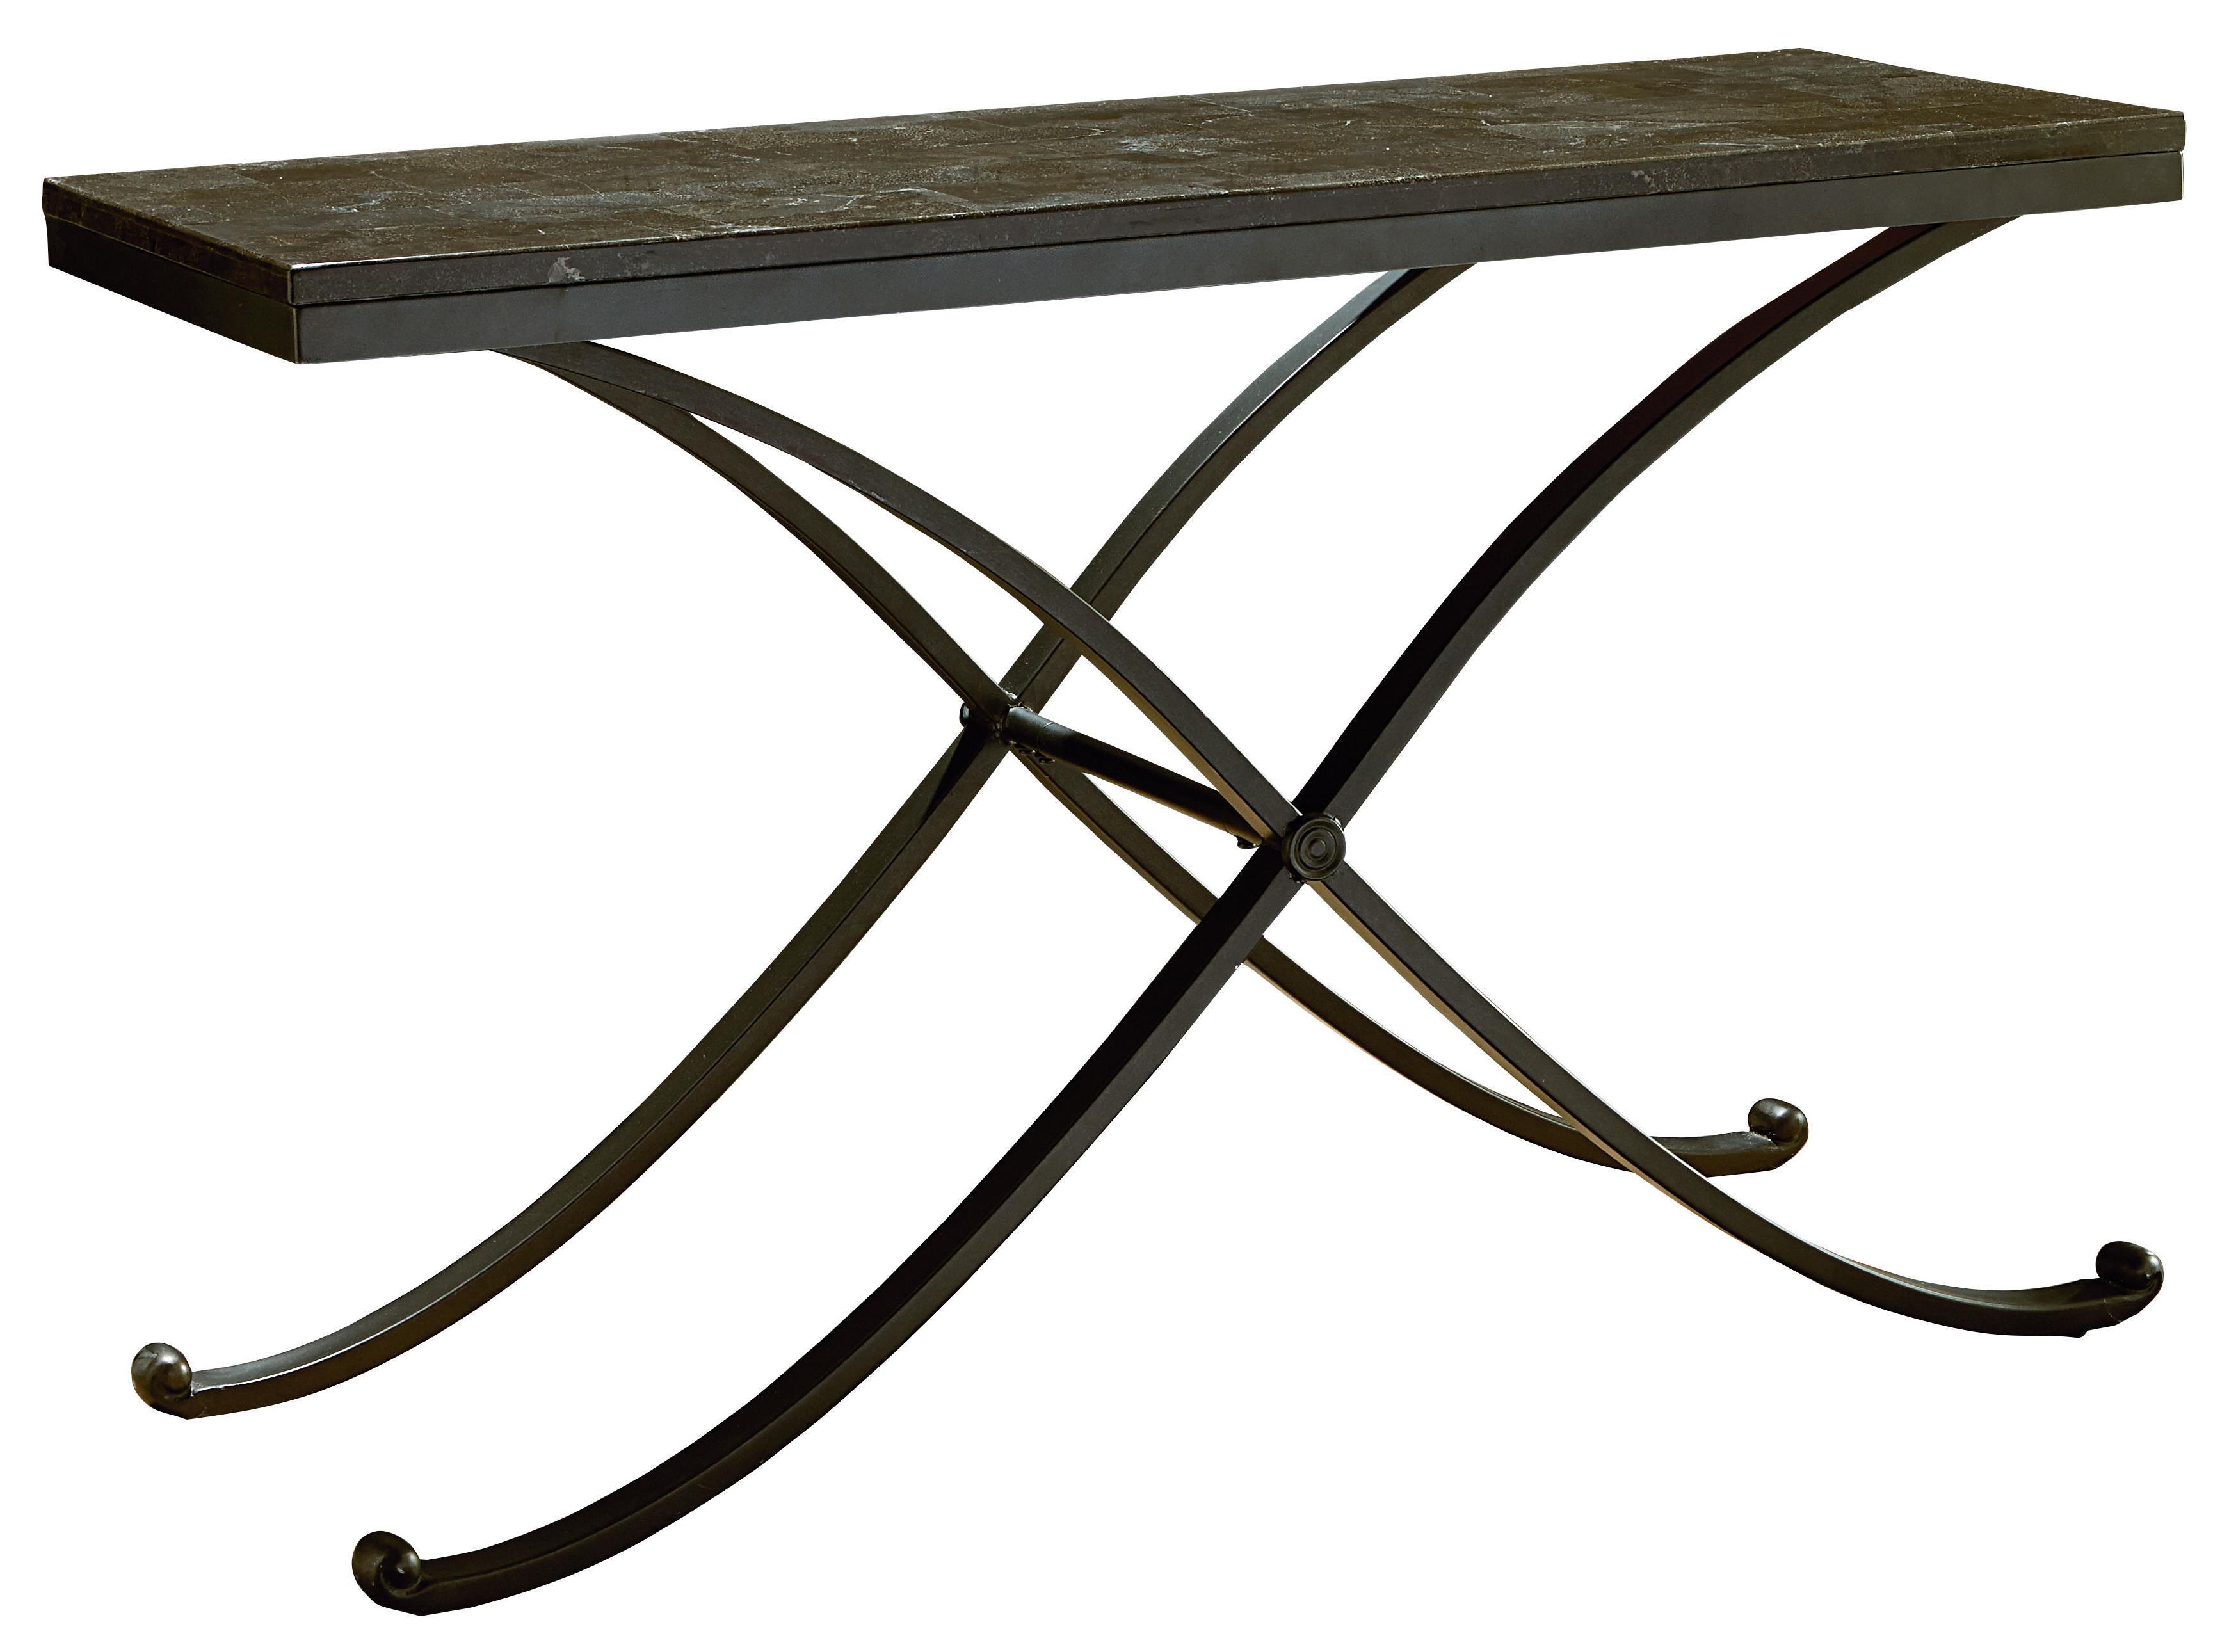 Standard Furniture Santiago Sofa Table - Item Number: 28727